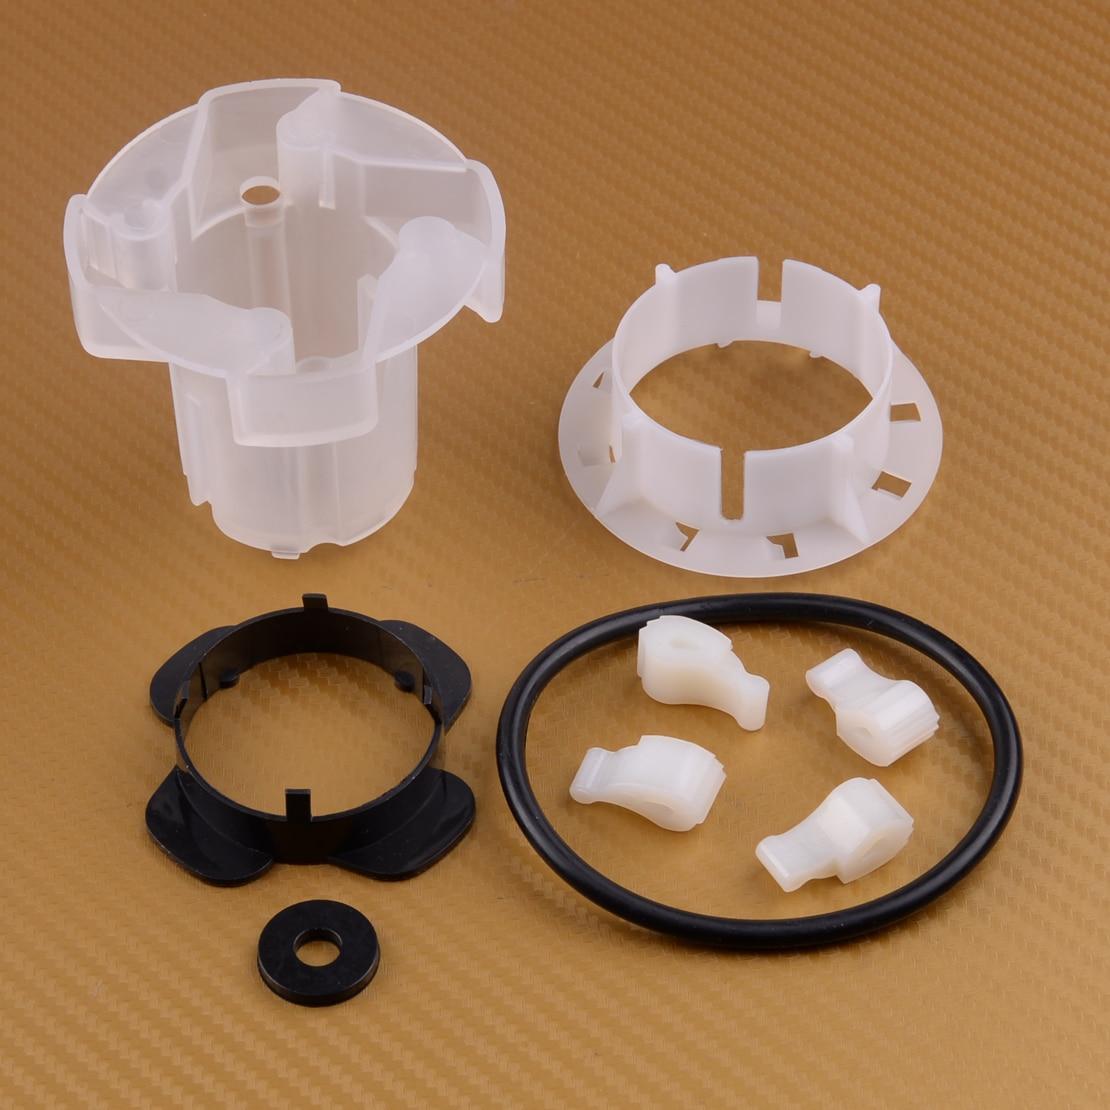 Agitator Cam Repair Kit Washing Machine Parts 285811 PS334650 AP3138838 3347410 Replacement Fit for Whirlpool WasherAgitator Cam Repair Kit Washing Machine Parts 285811 PS334650 AP3138838 3347410 Replacement Fit for Whirlpool Washer